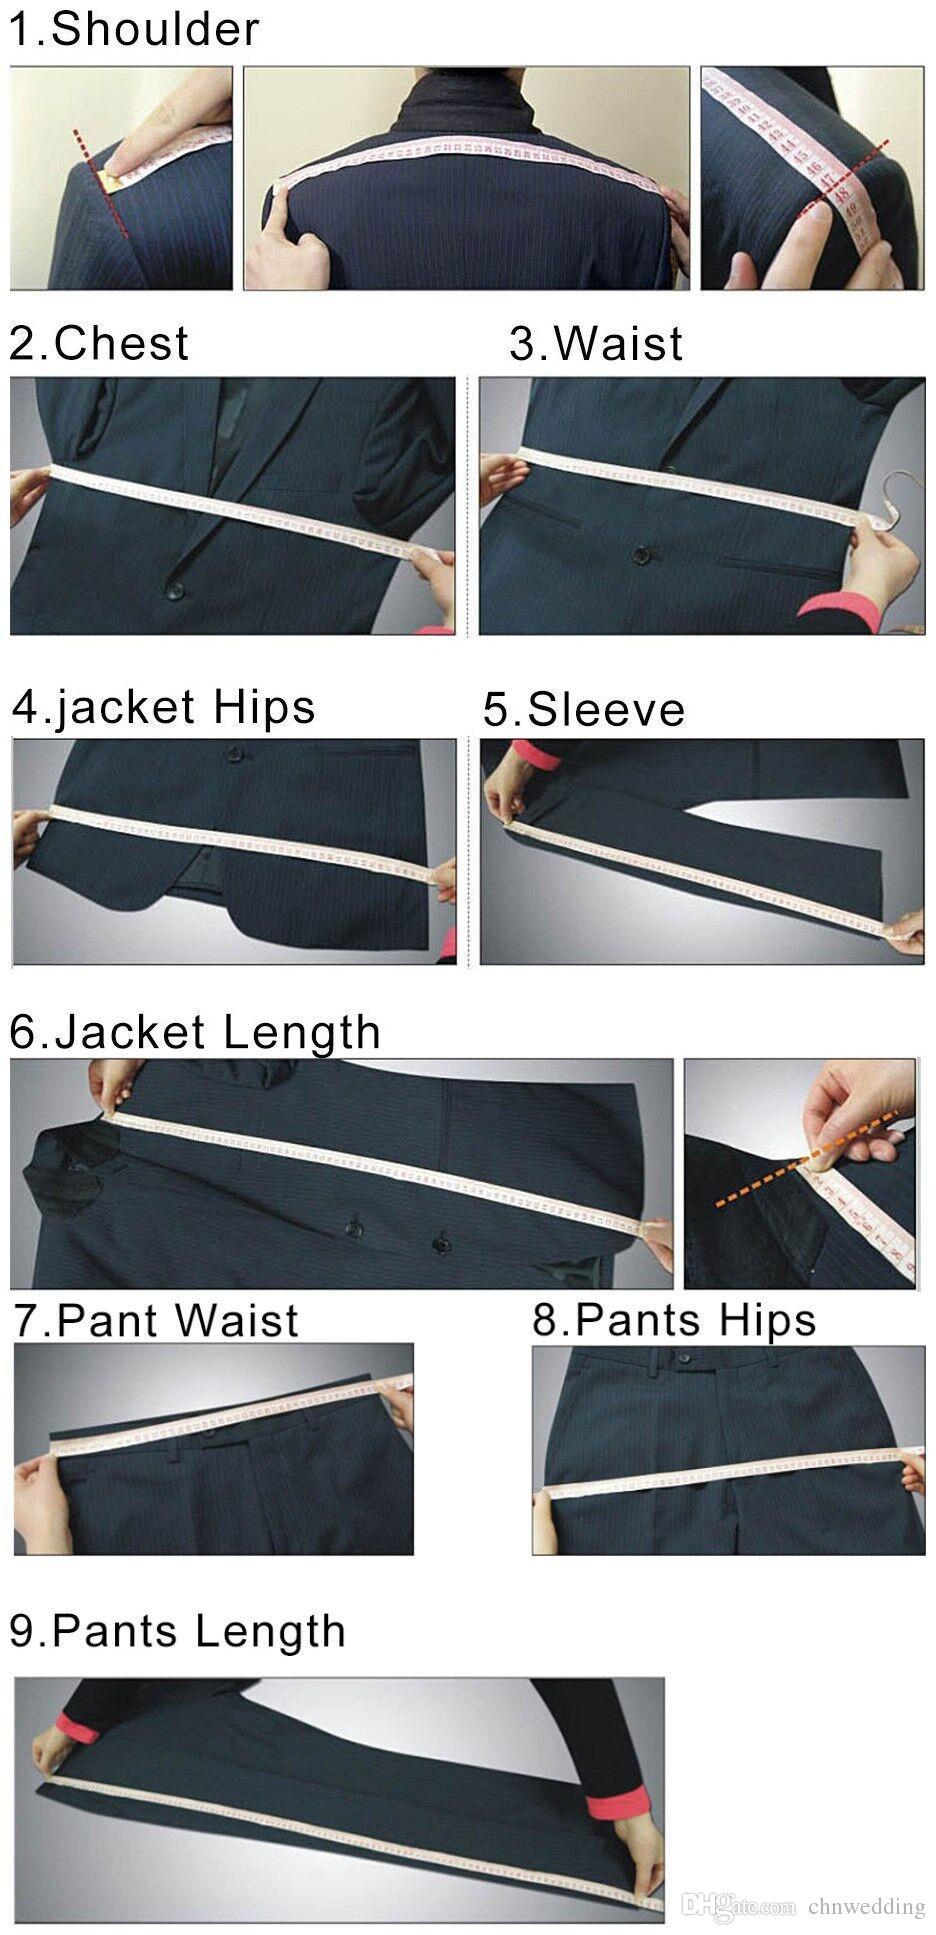 Custom Slim Fit Black Men Suits Jacket+Vest+Pants2018 for Wedding Groom Tuxedos Best Man Suits Prom Wear